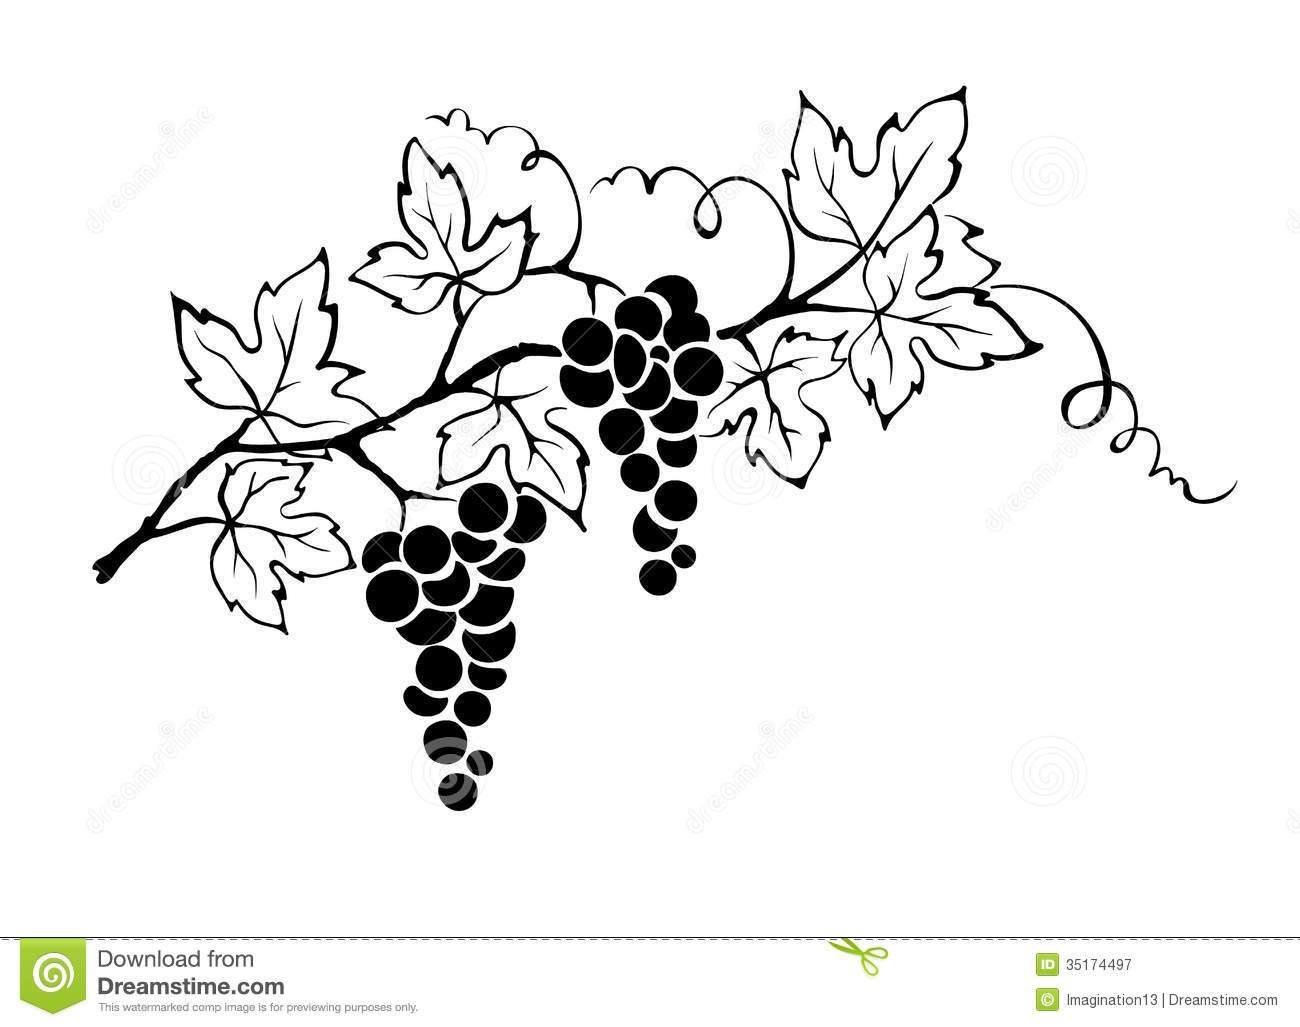 Clipart grape vine » Clipart Portal.